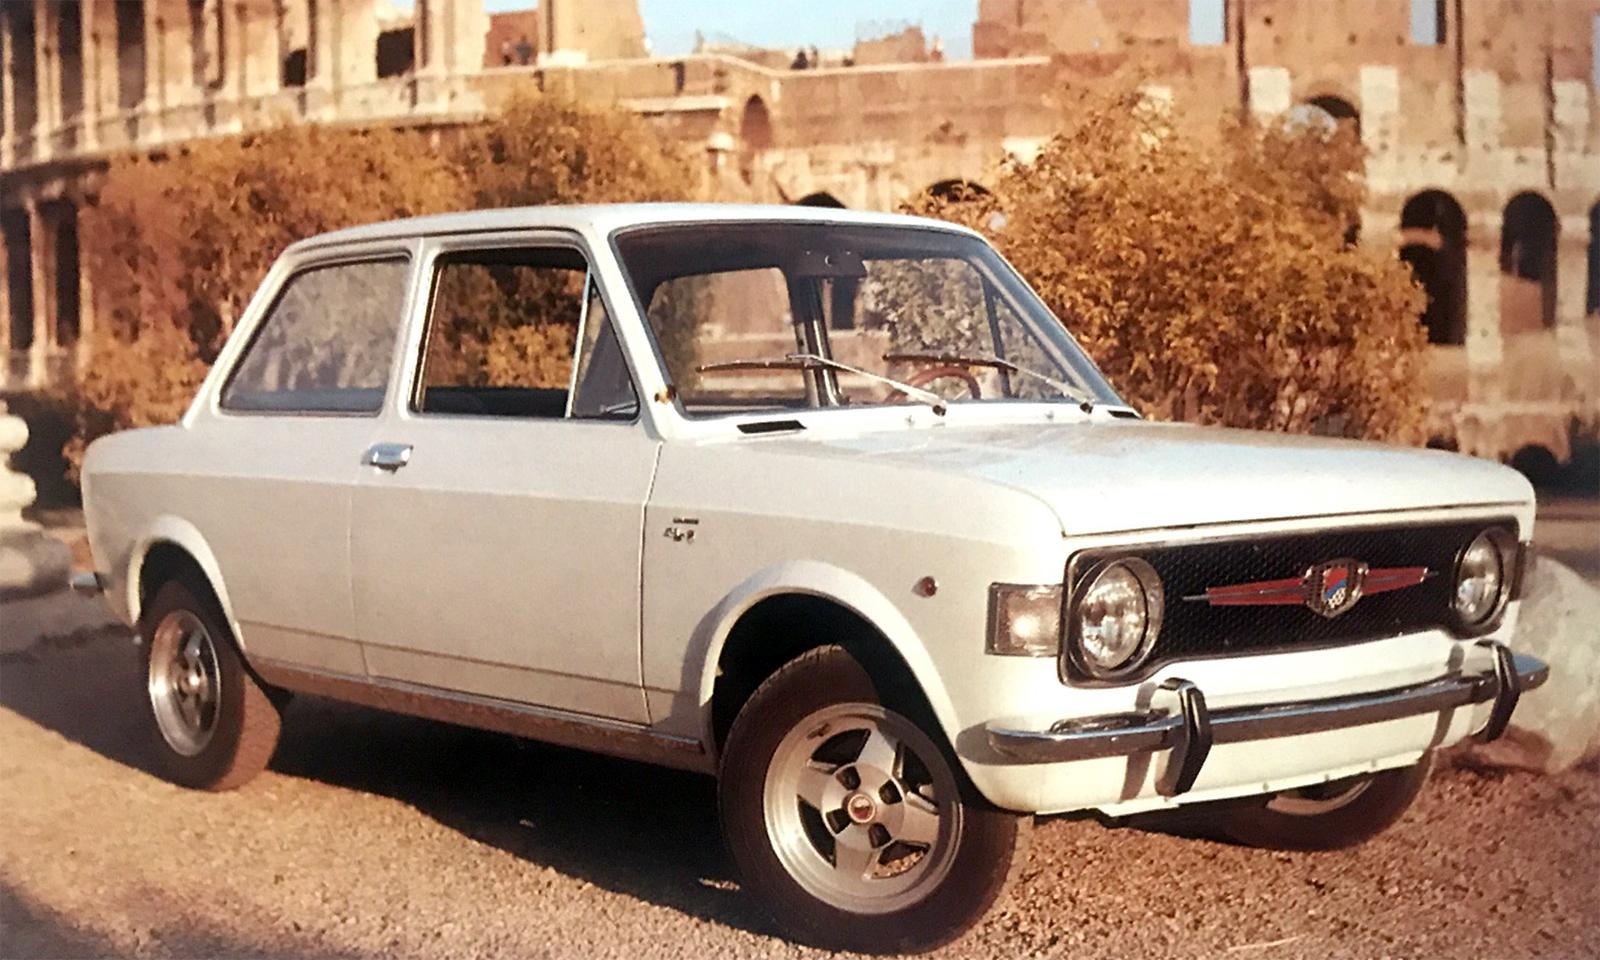 6-650-np-1970